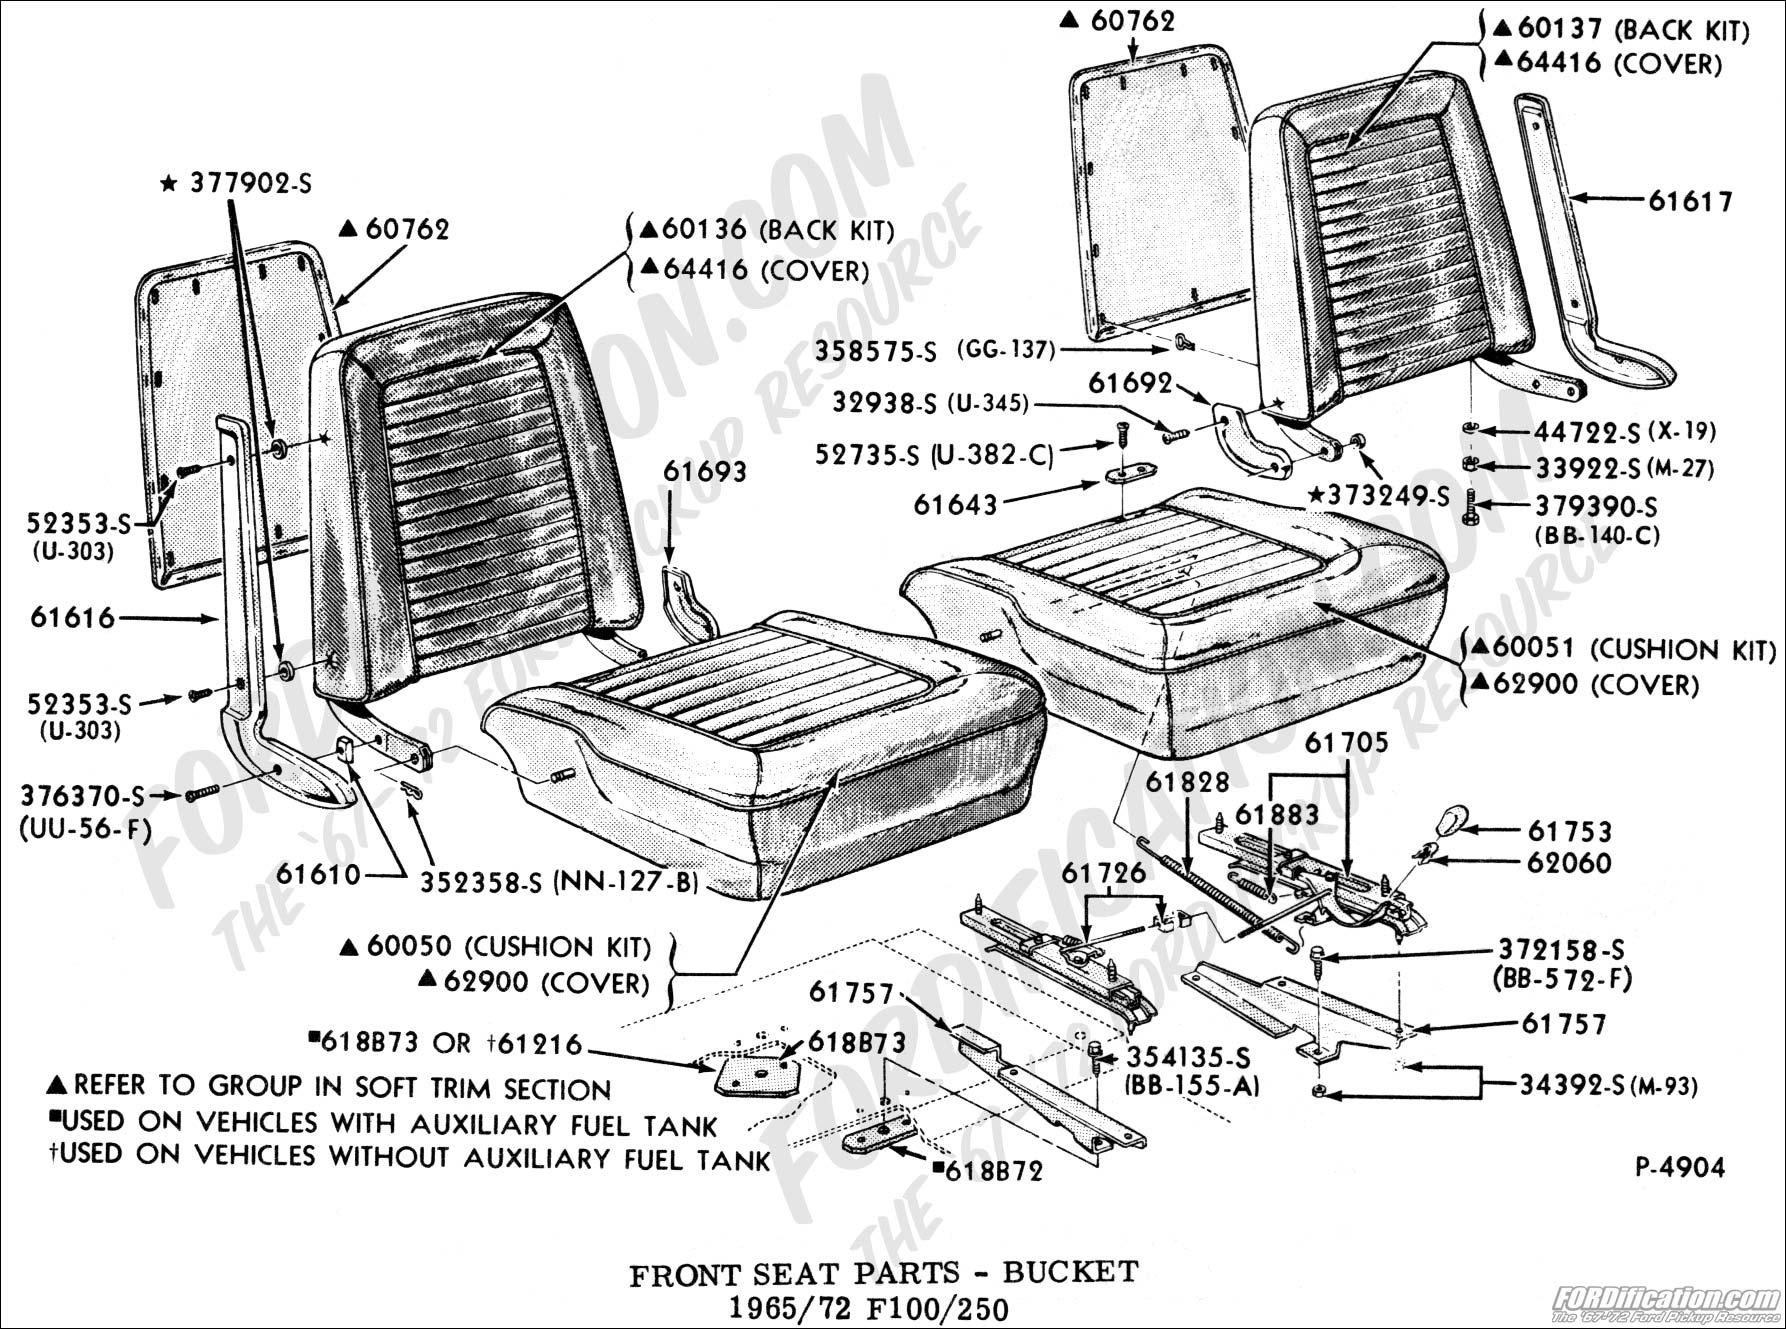 Factory Bucket Mounting Hardware